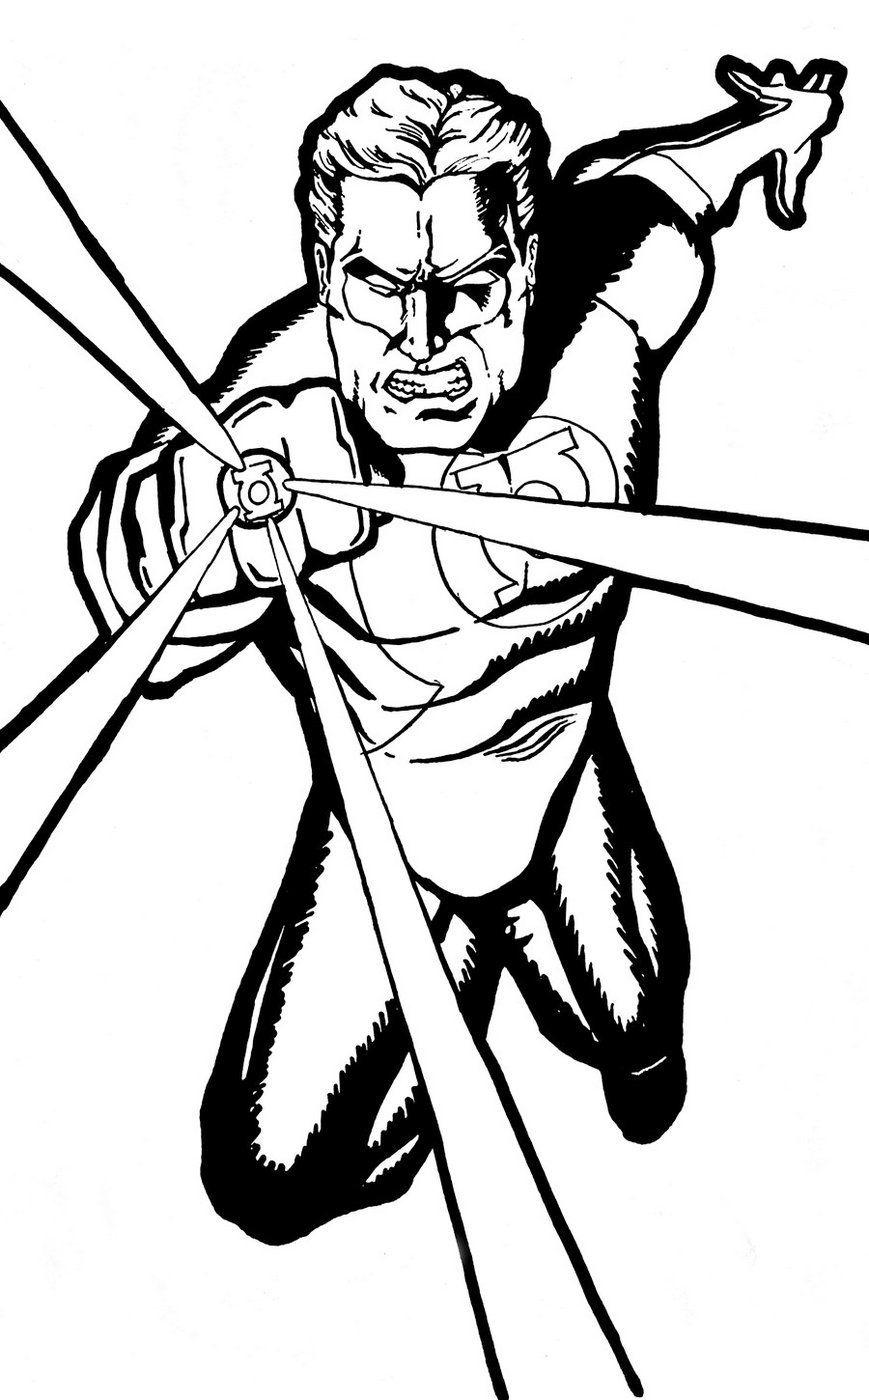 869x1400 Green Lantern Coloring Page Printable Superhero Coloring